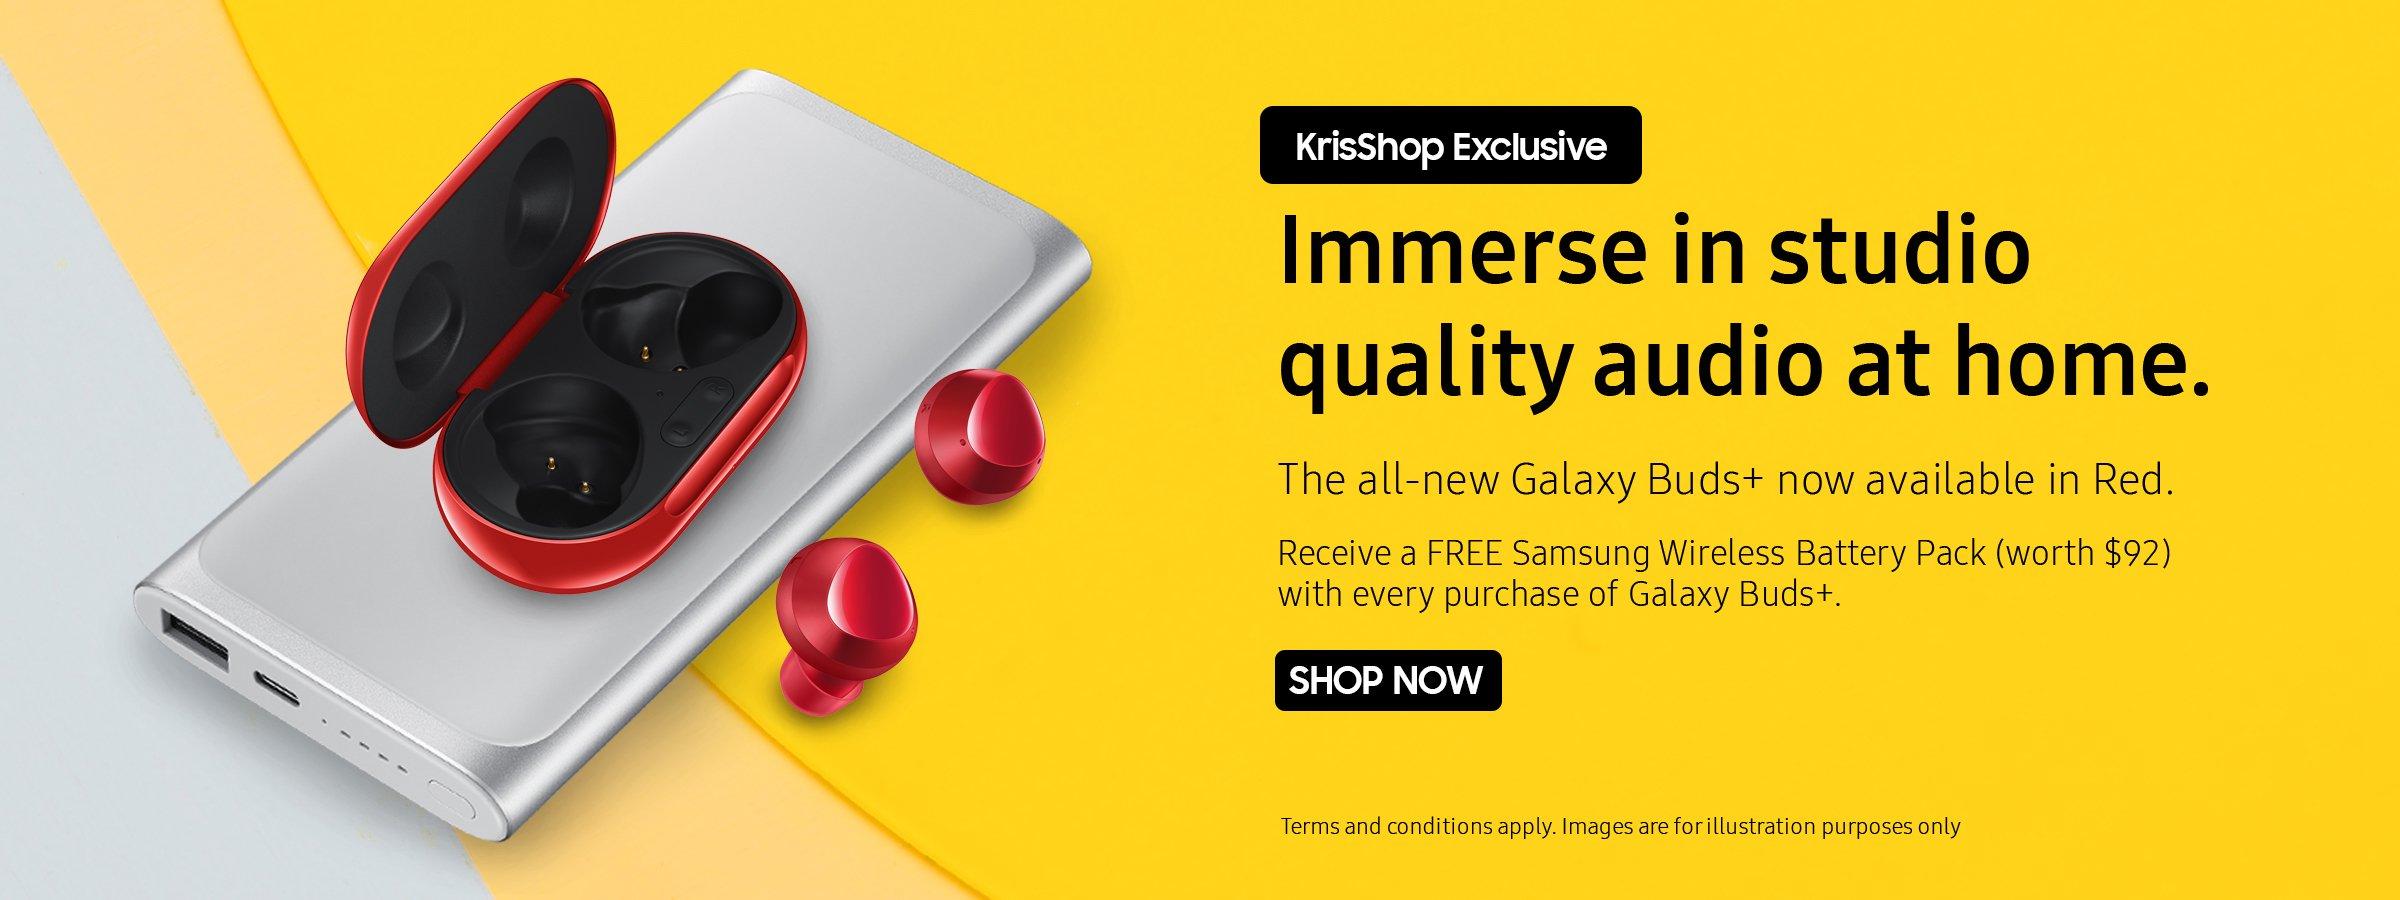 Samsung x KrisShop Exclusive - All-new Galaxy Buds+